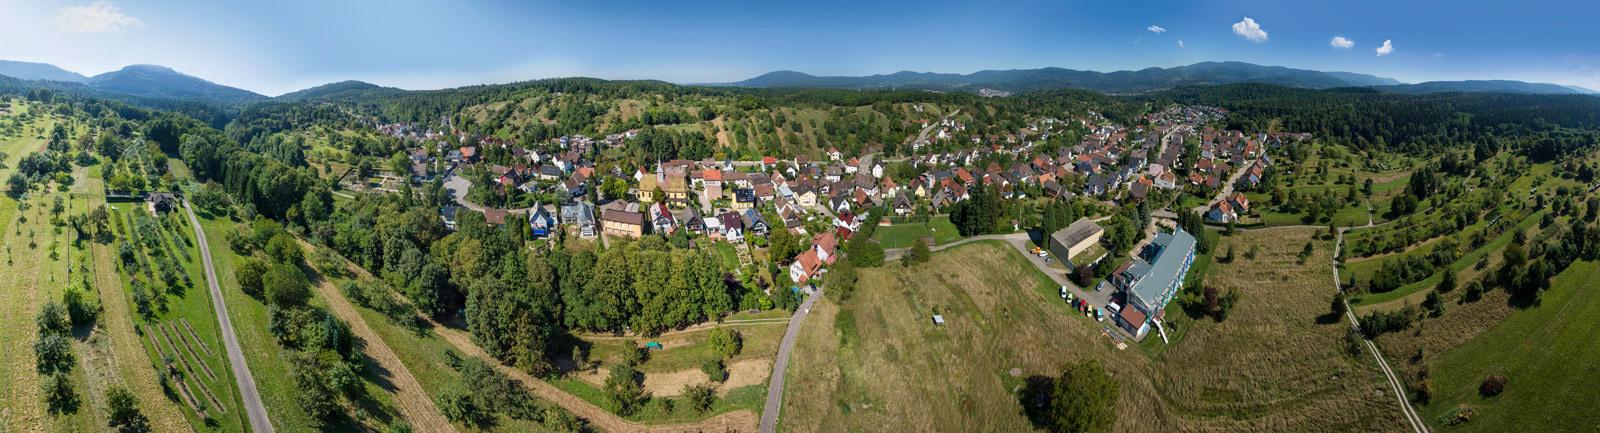 DSC7803-360_Luftaufnahme_Panorama_Gaggenau_Selbach Luftbilder